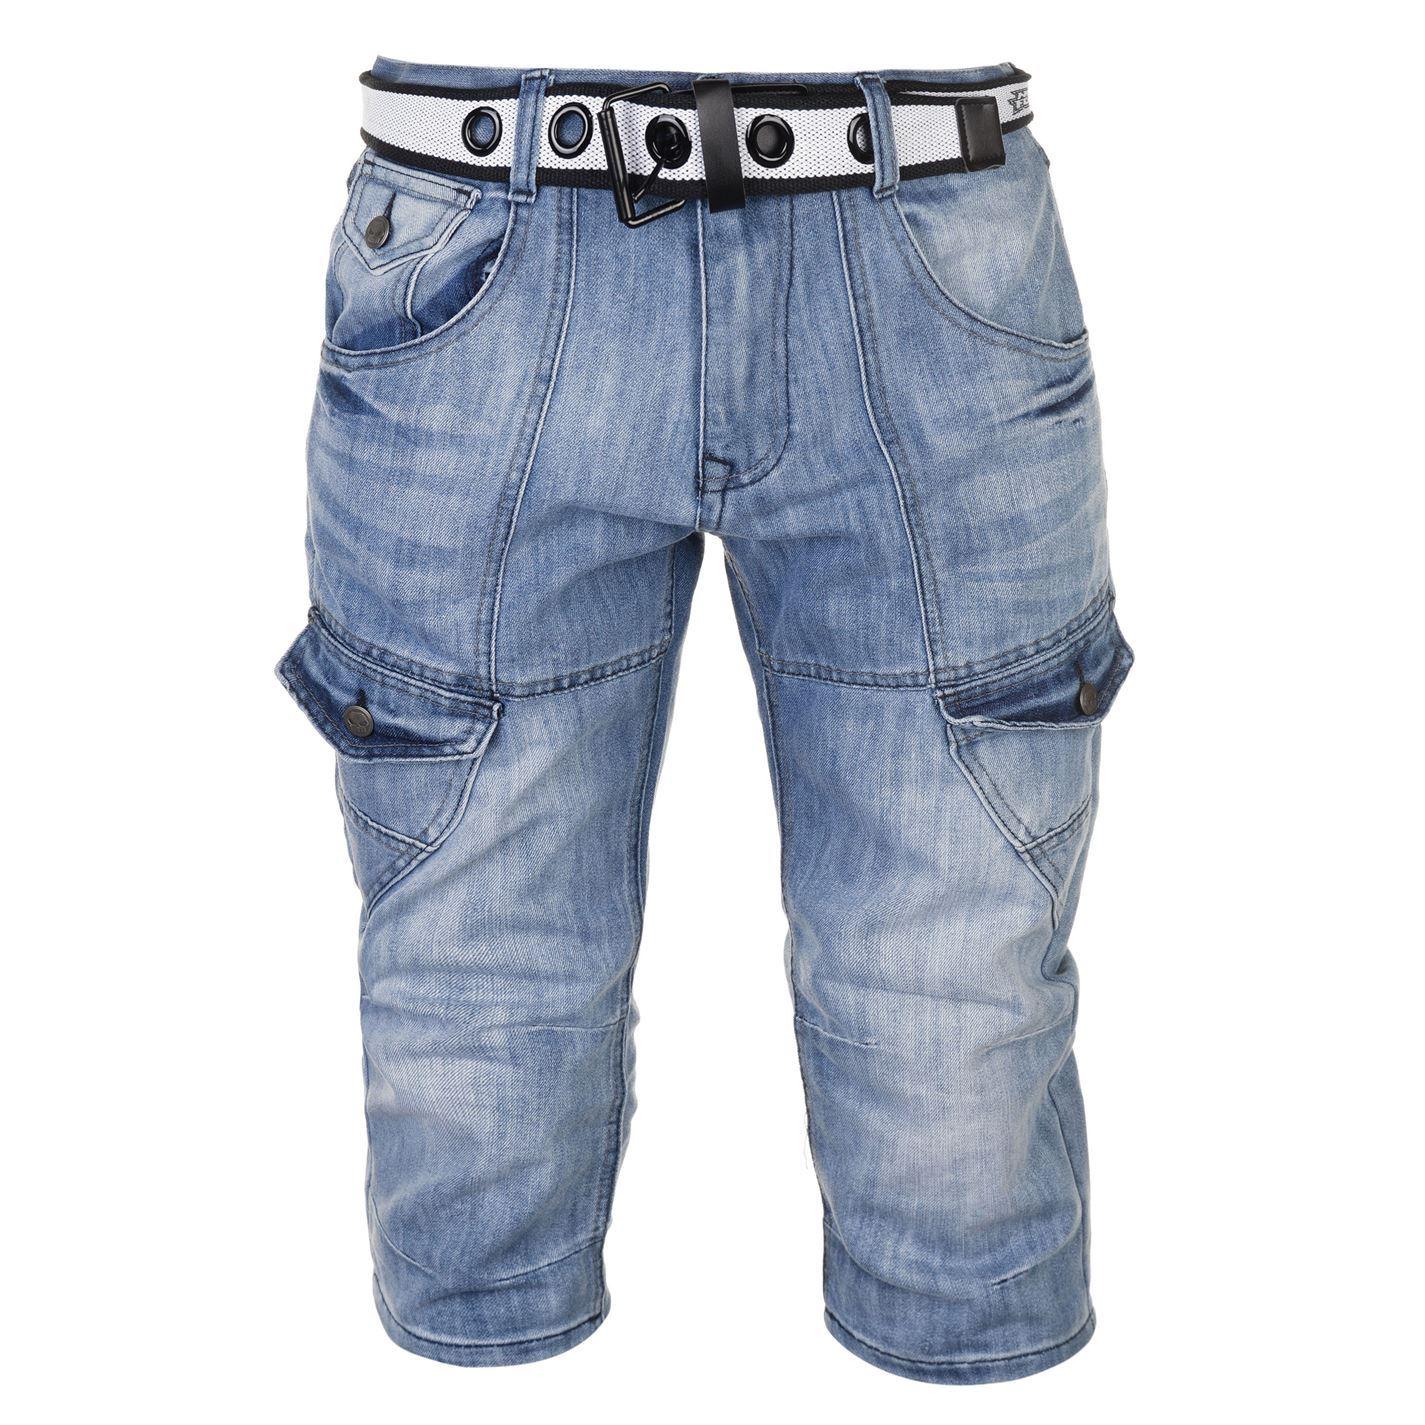 No-Fear-Belted-Cargo-Shorts-Mens-Bottoms-Short-Pants-Summerwear thumbnail 10